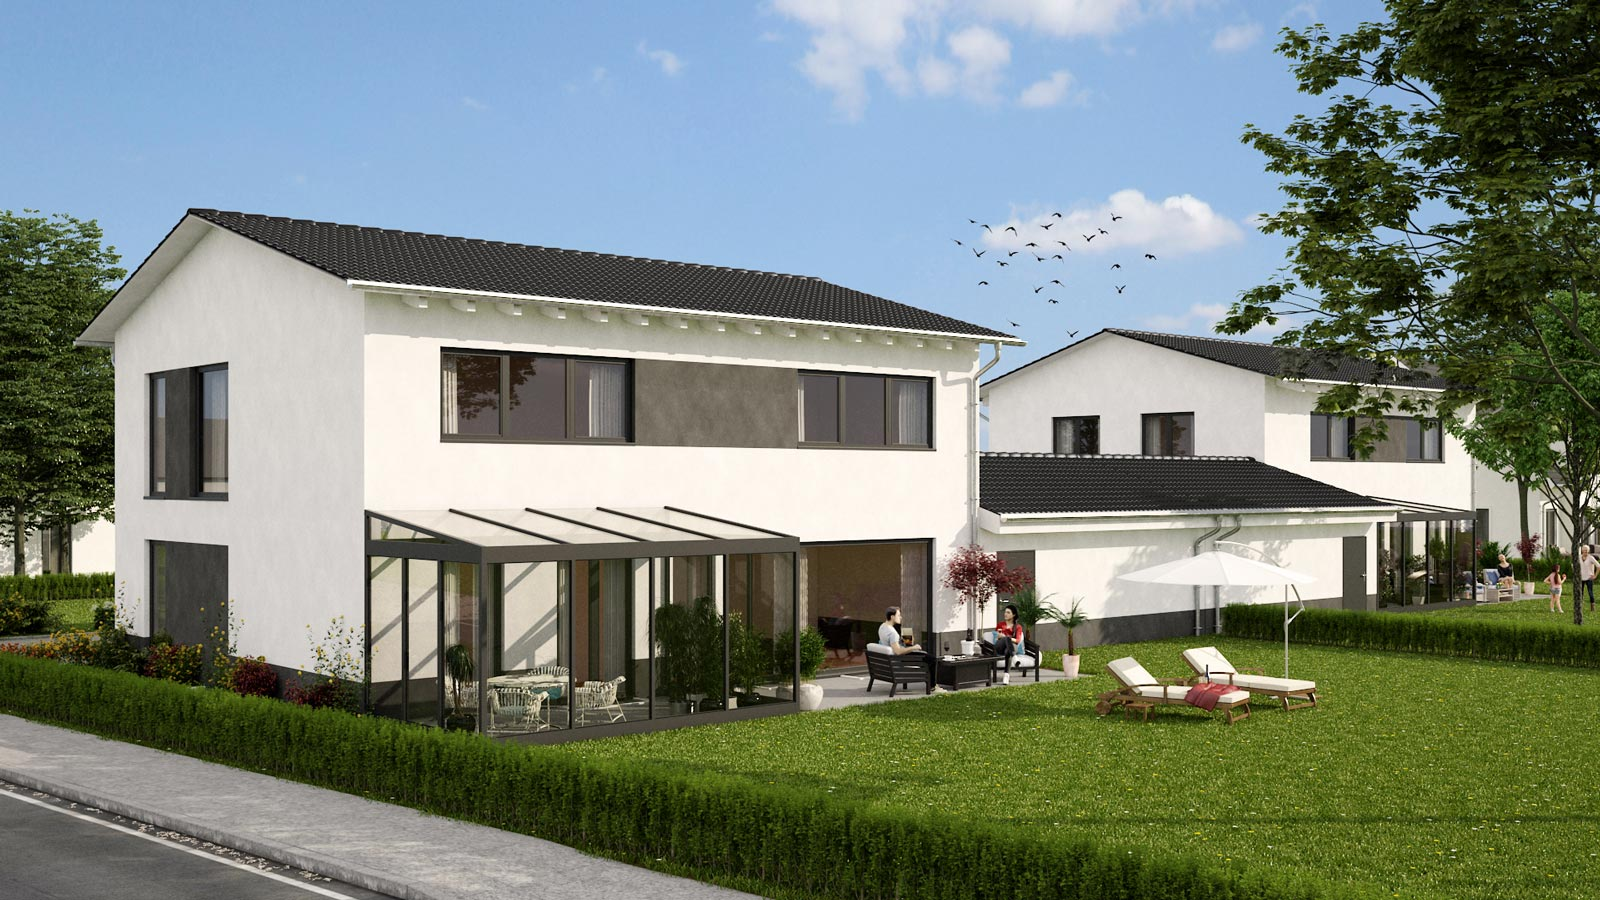 Tm Wohnbau - Einfamilienhaus Massiv